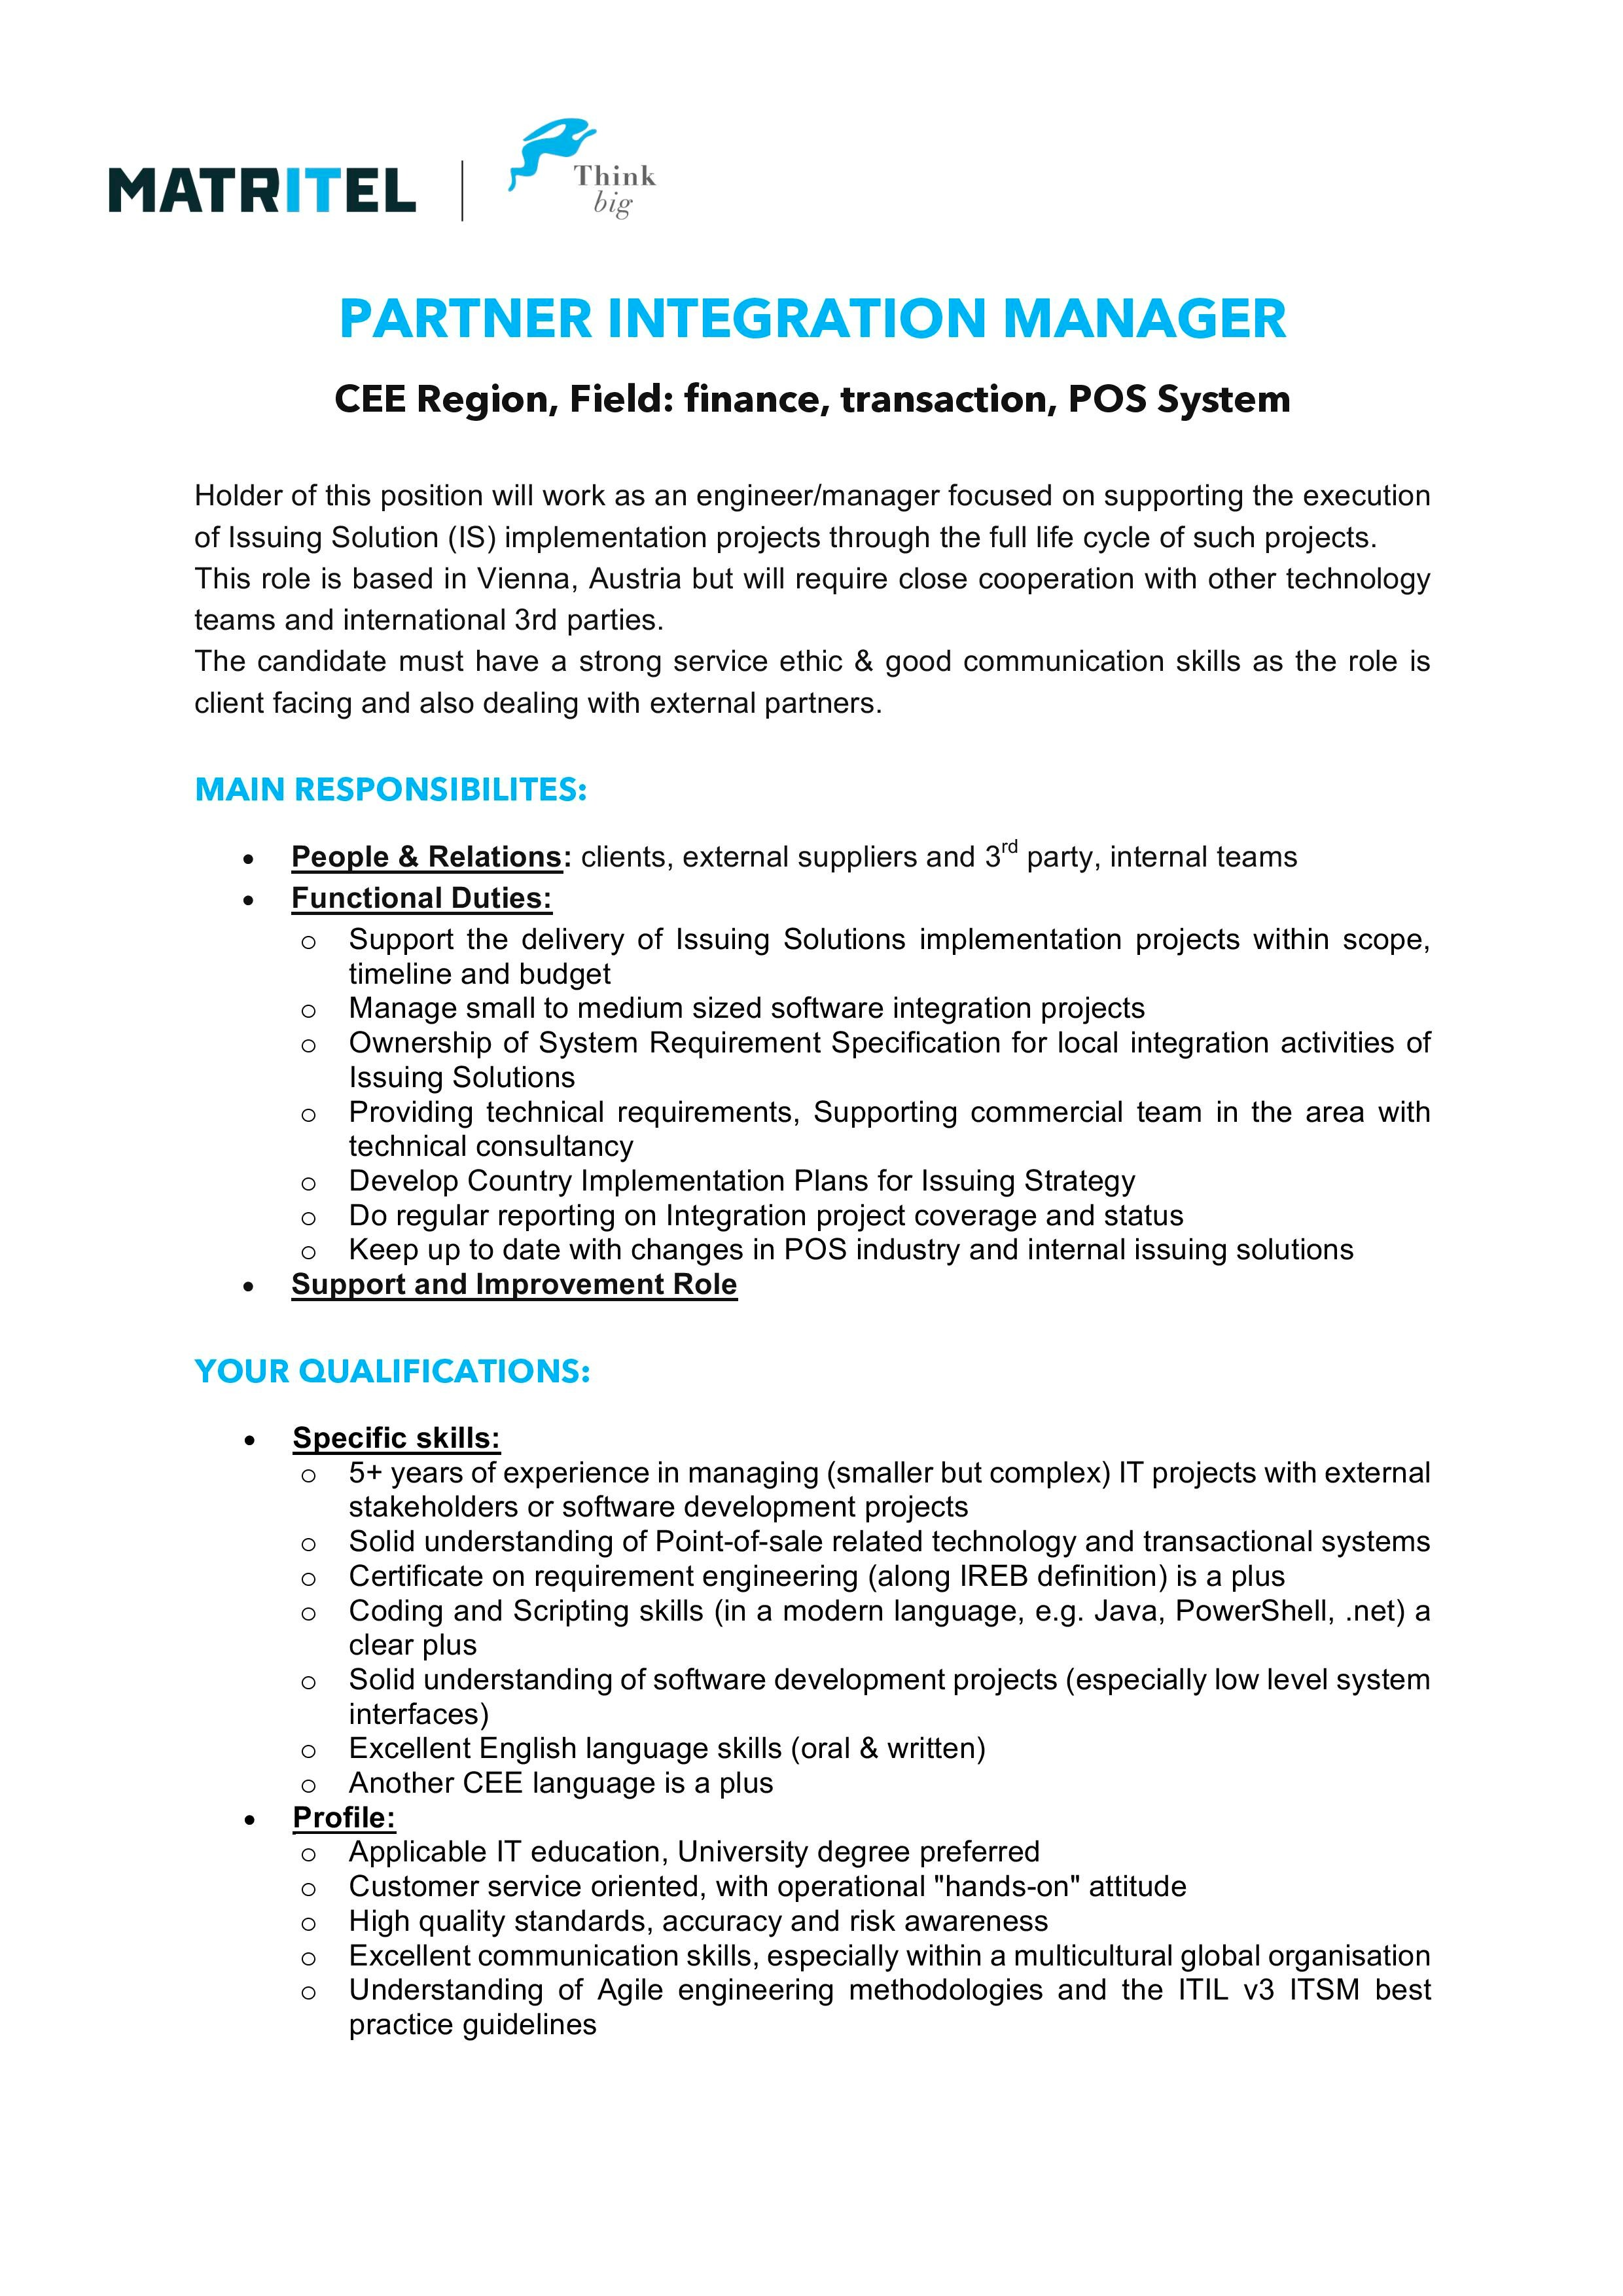 Matritel_Partner Integration Manager_Bestjobs-page-001 (1)